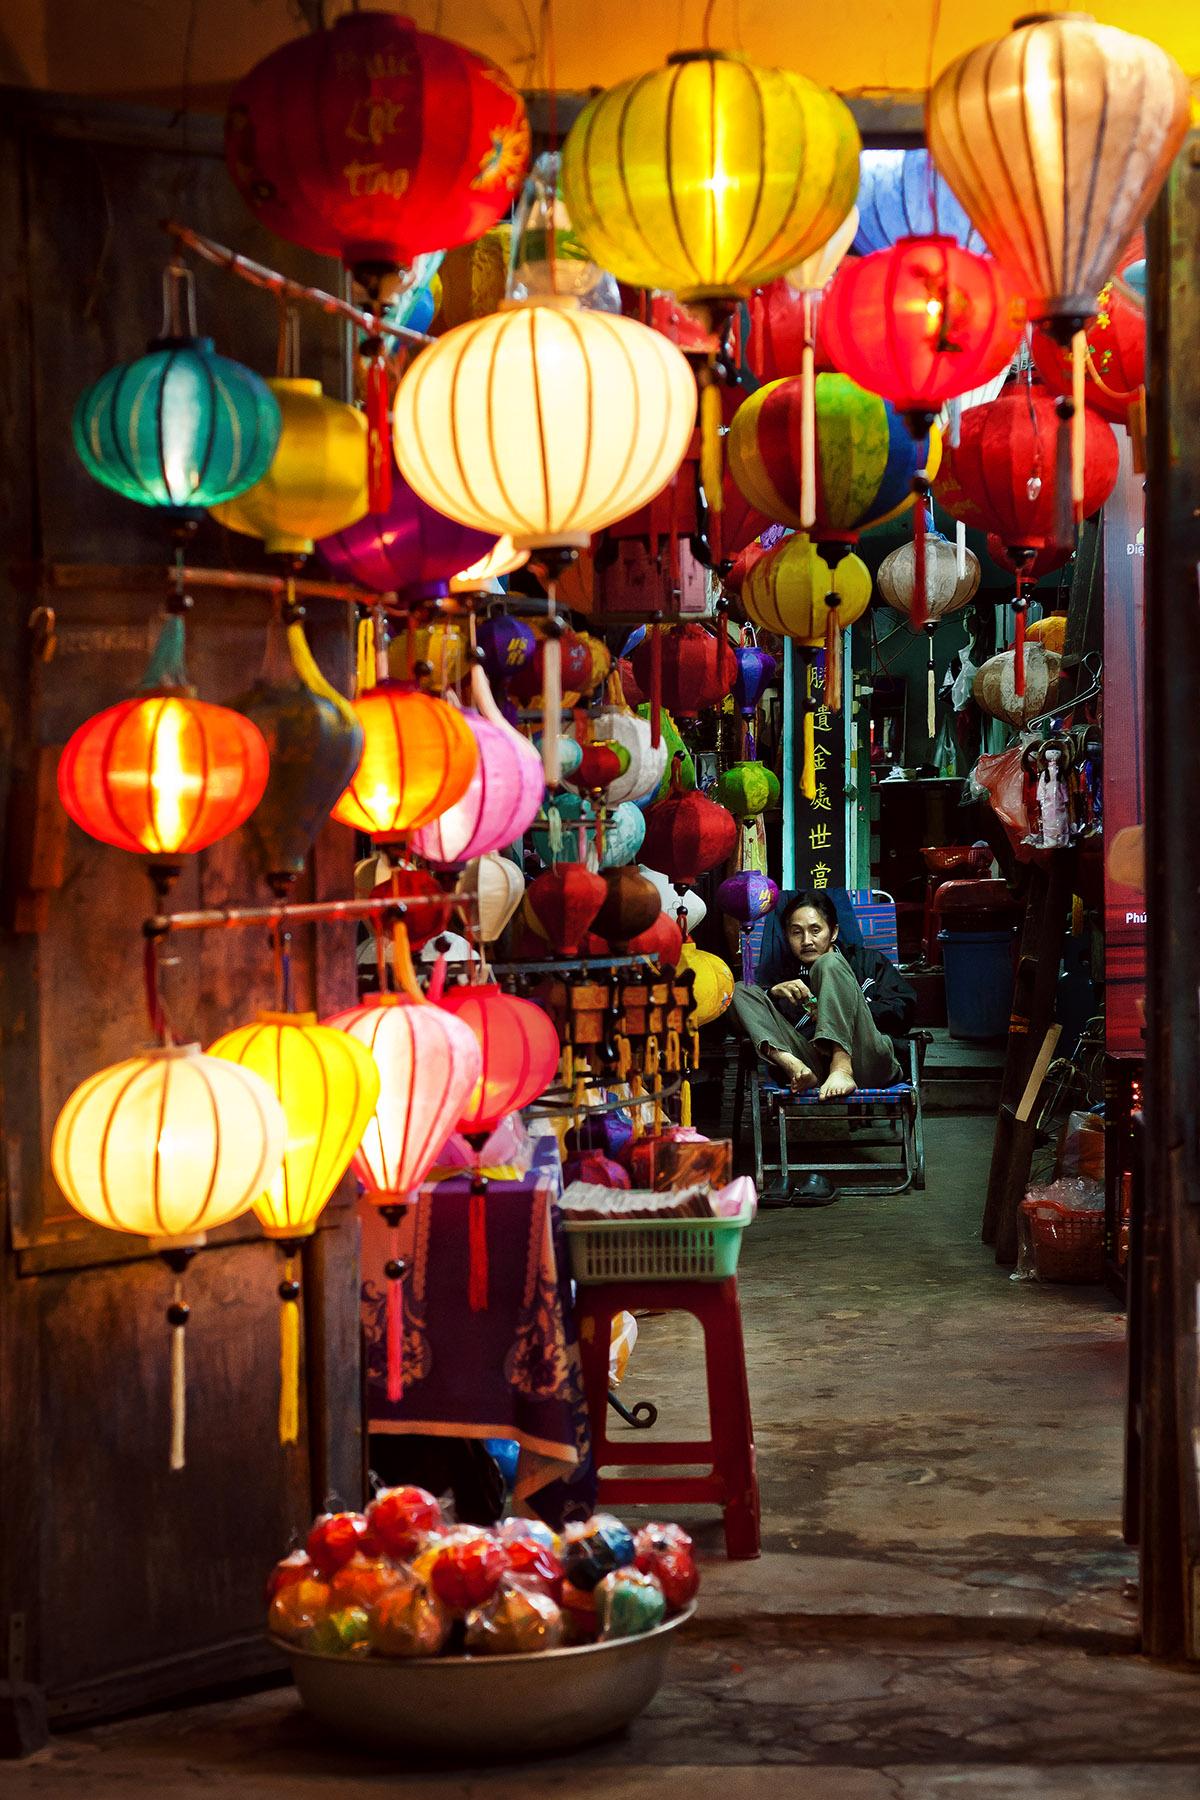 Vietnam_06_hoian_005